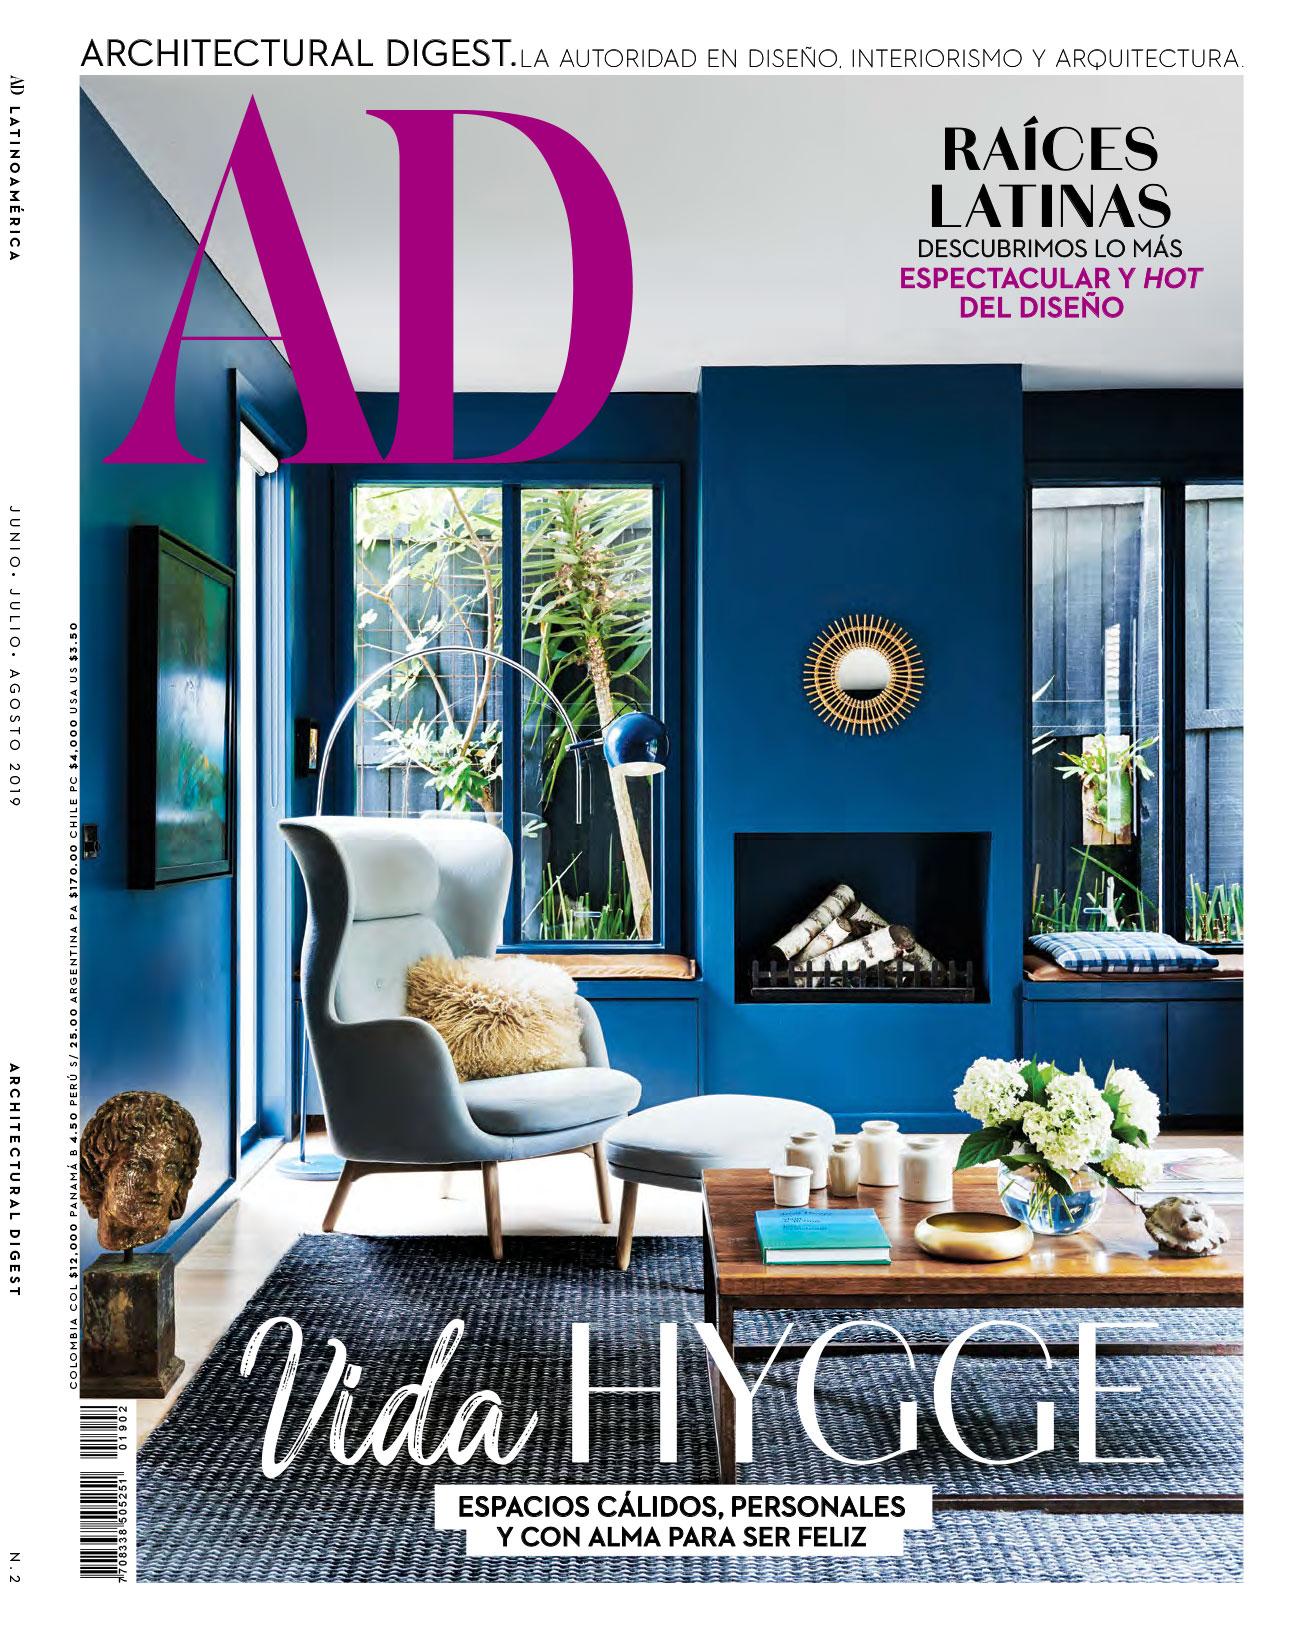 AD-HOC-Print-publications-17.jpg